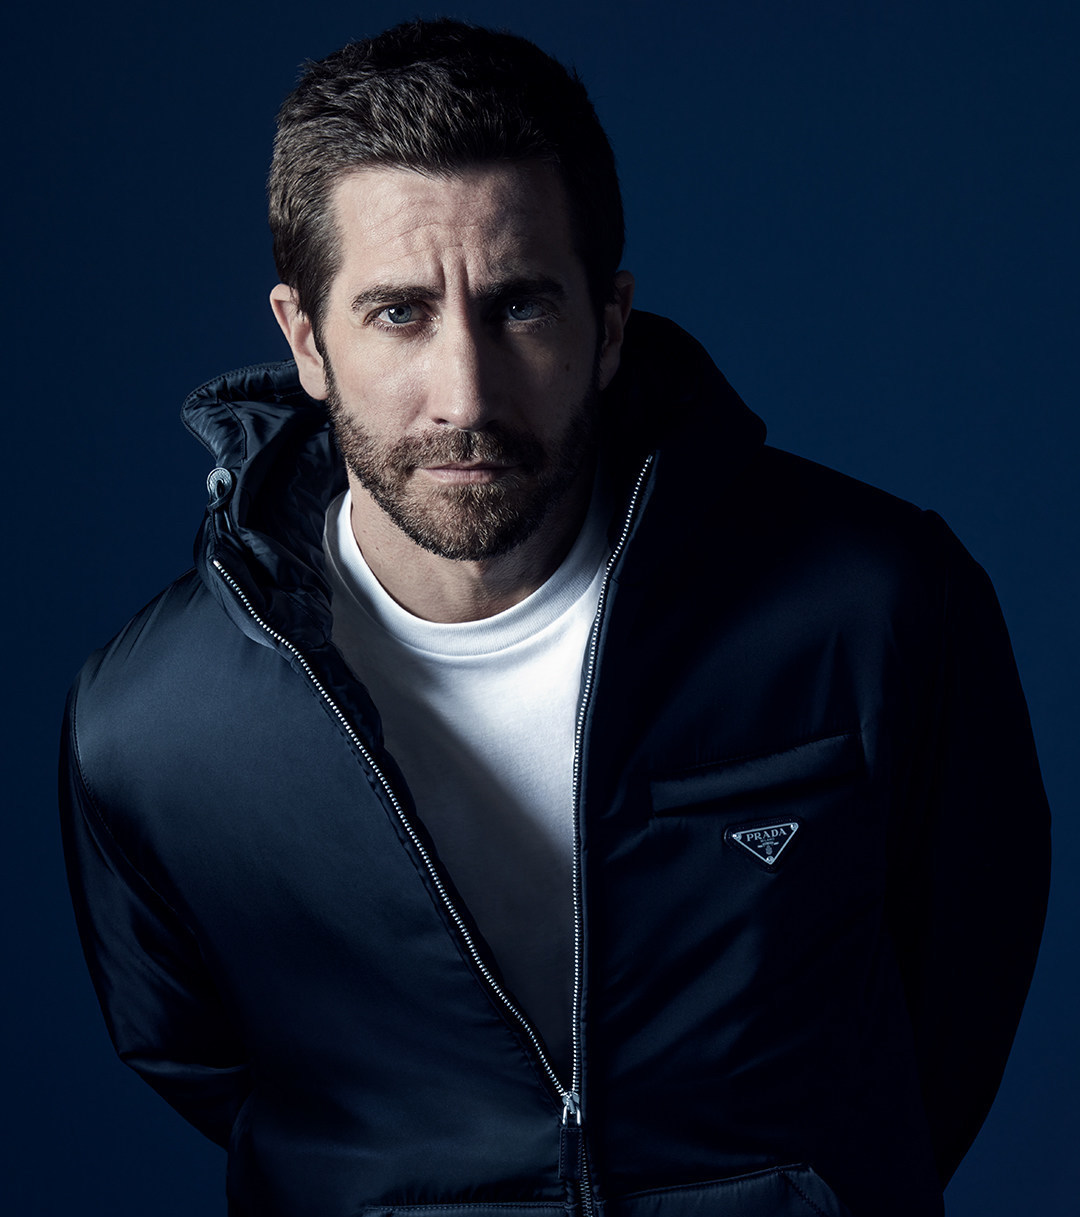 Prada-Jake-Gyllenhaal